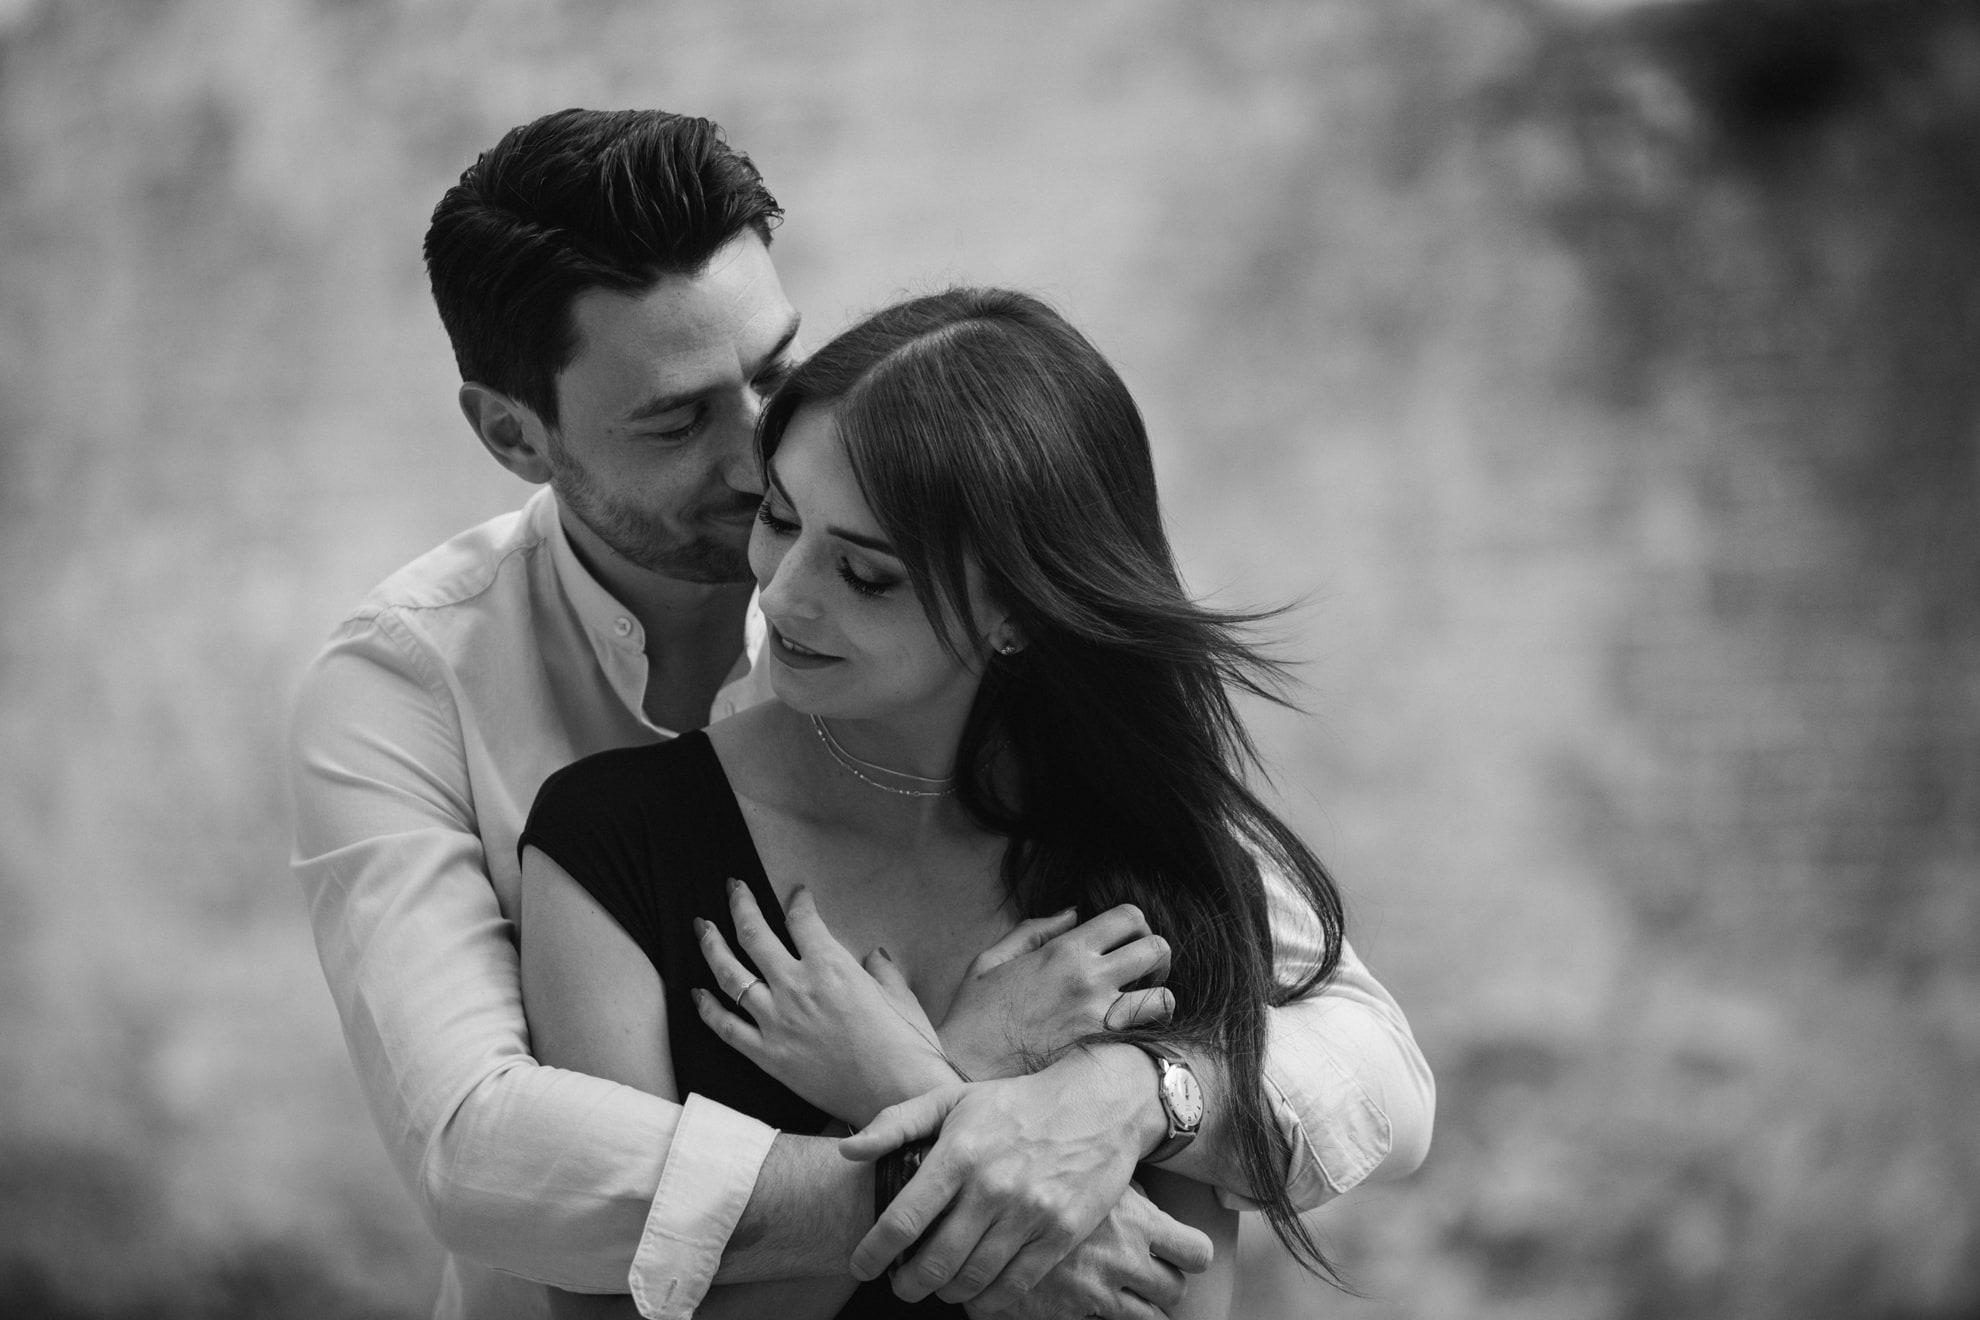 engagement venice venezia proposal proposta matrimonio fidanzamento irene pollacchi fotografa